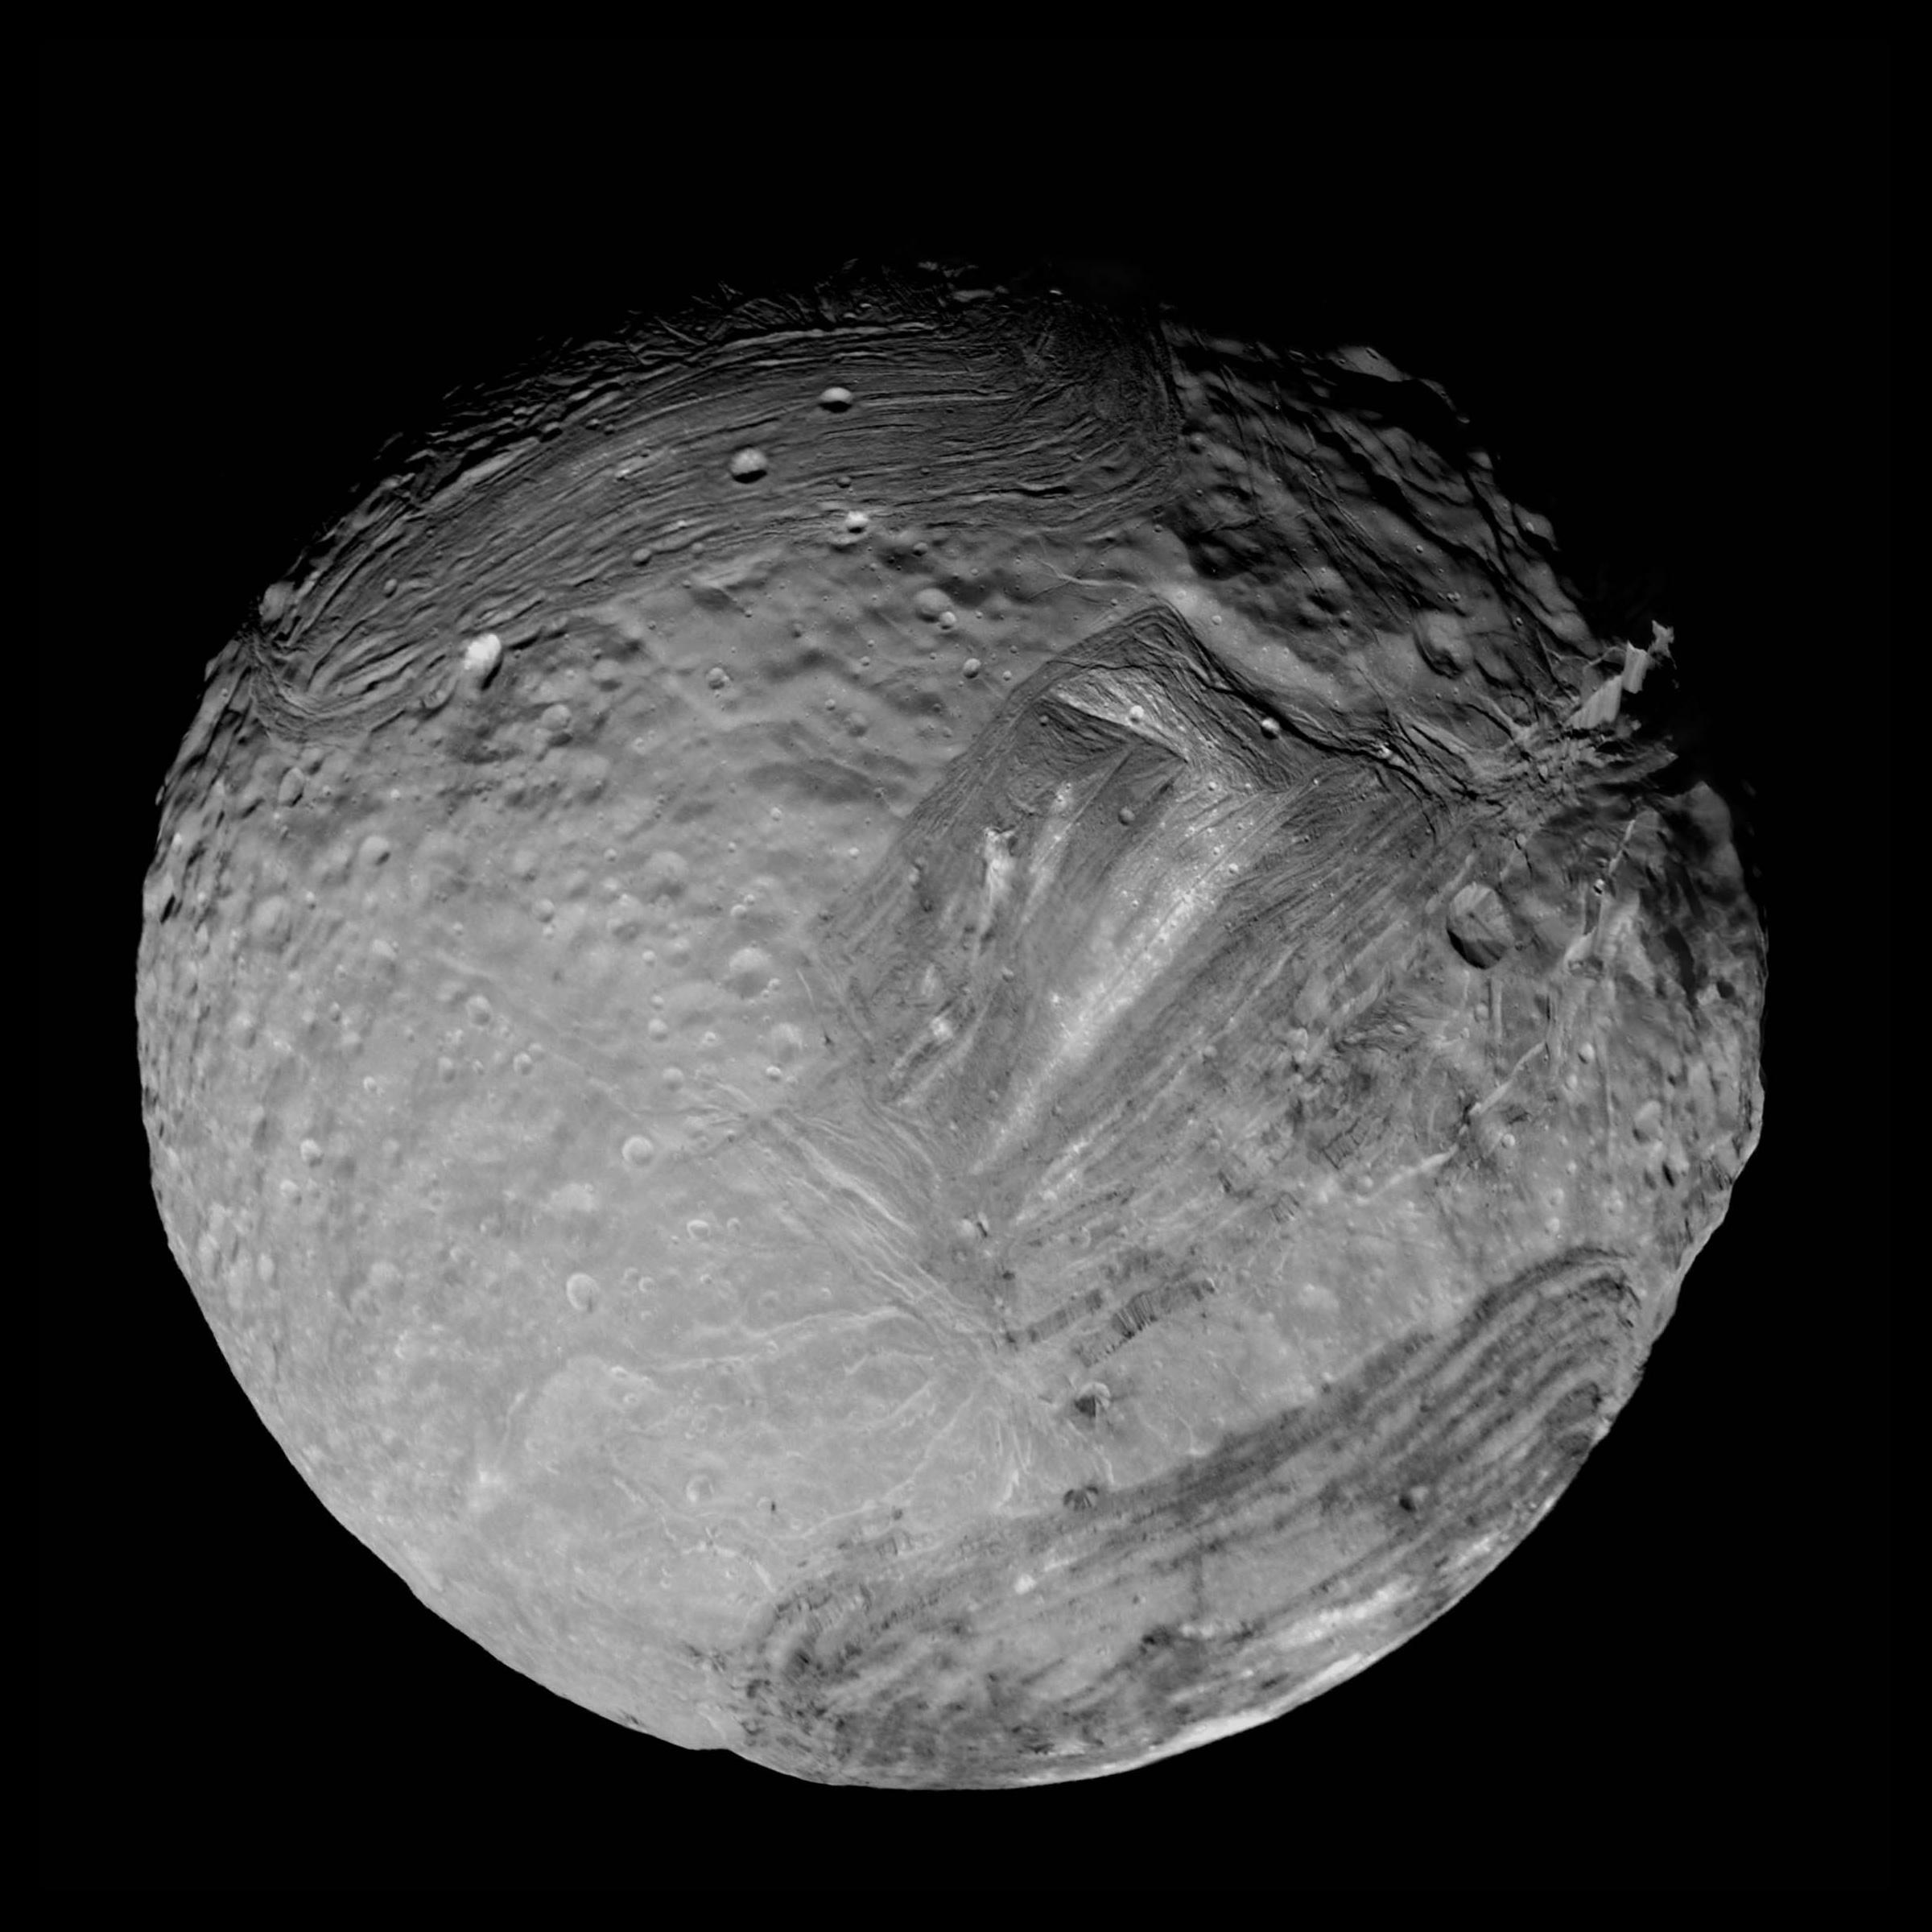 Wikipedia-Radiokarbbondatiing-Uran-Bleidatio